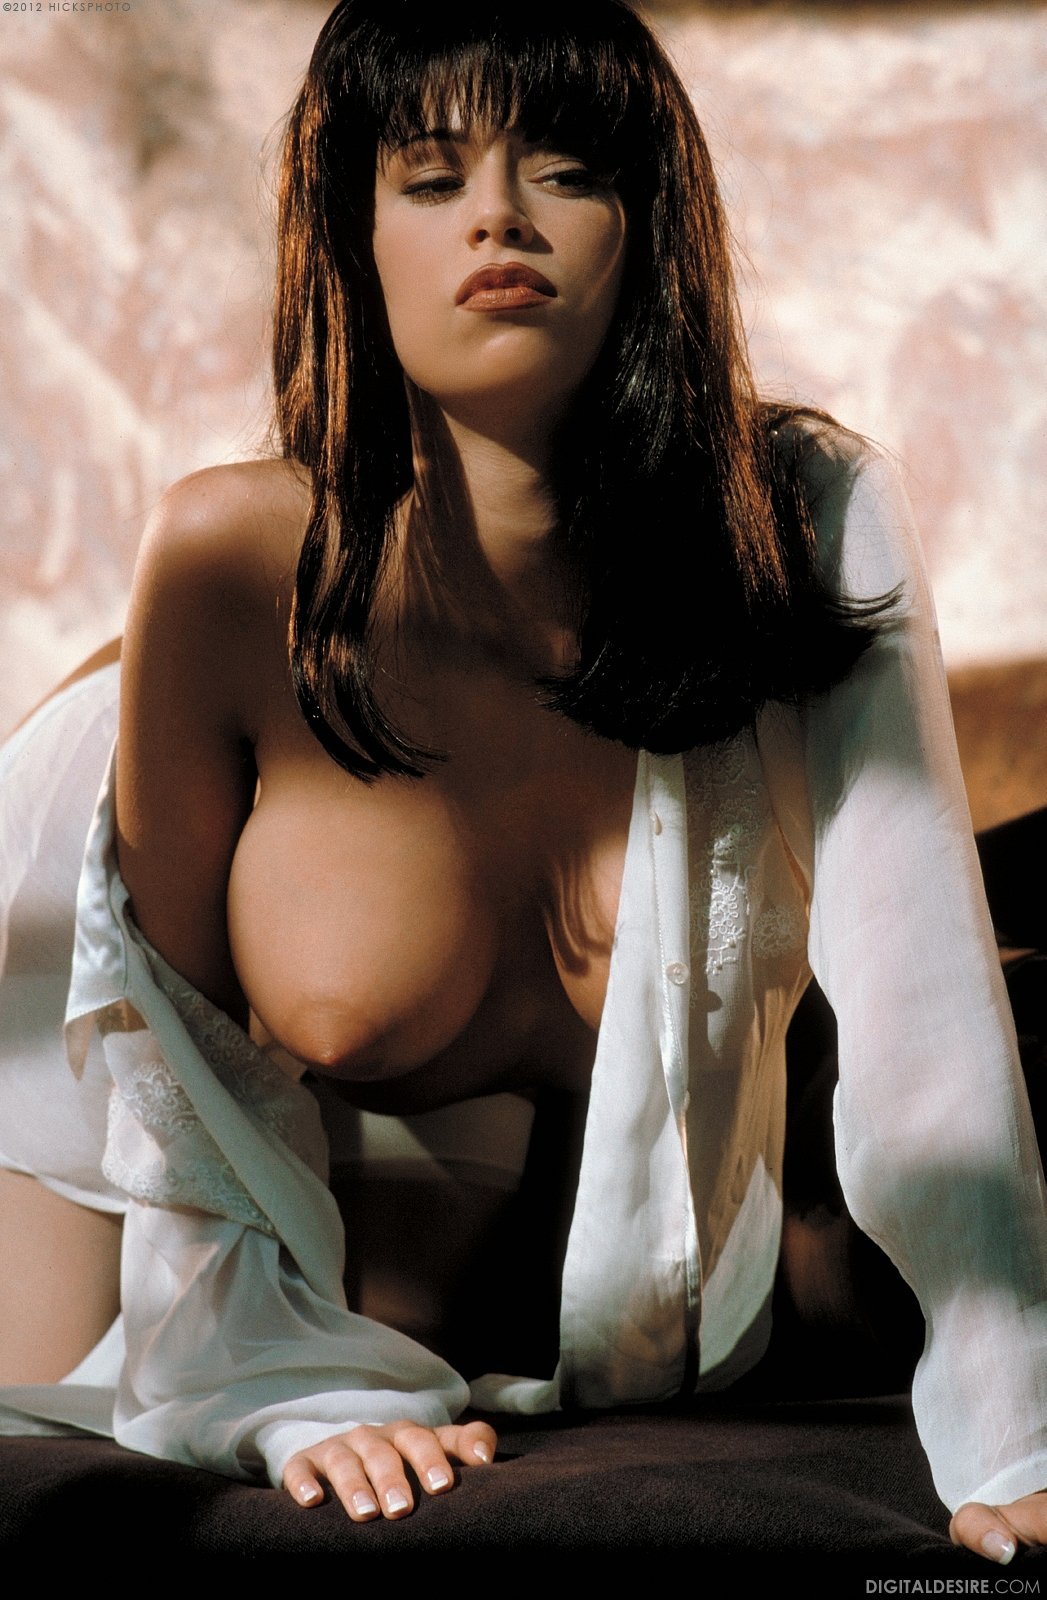 Busty Brunette Jenna Jameson In White Stockings Poses For -2026